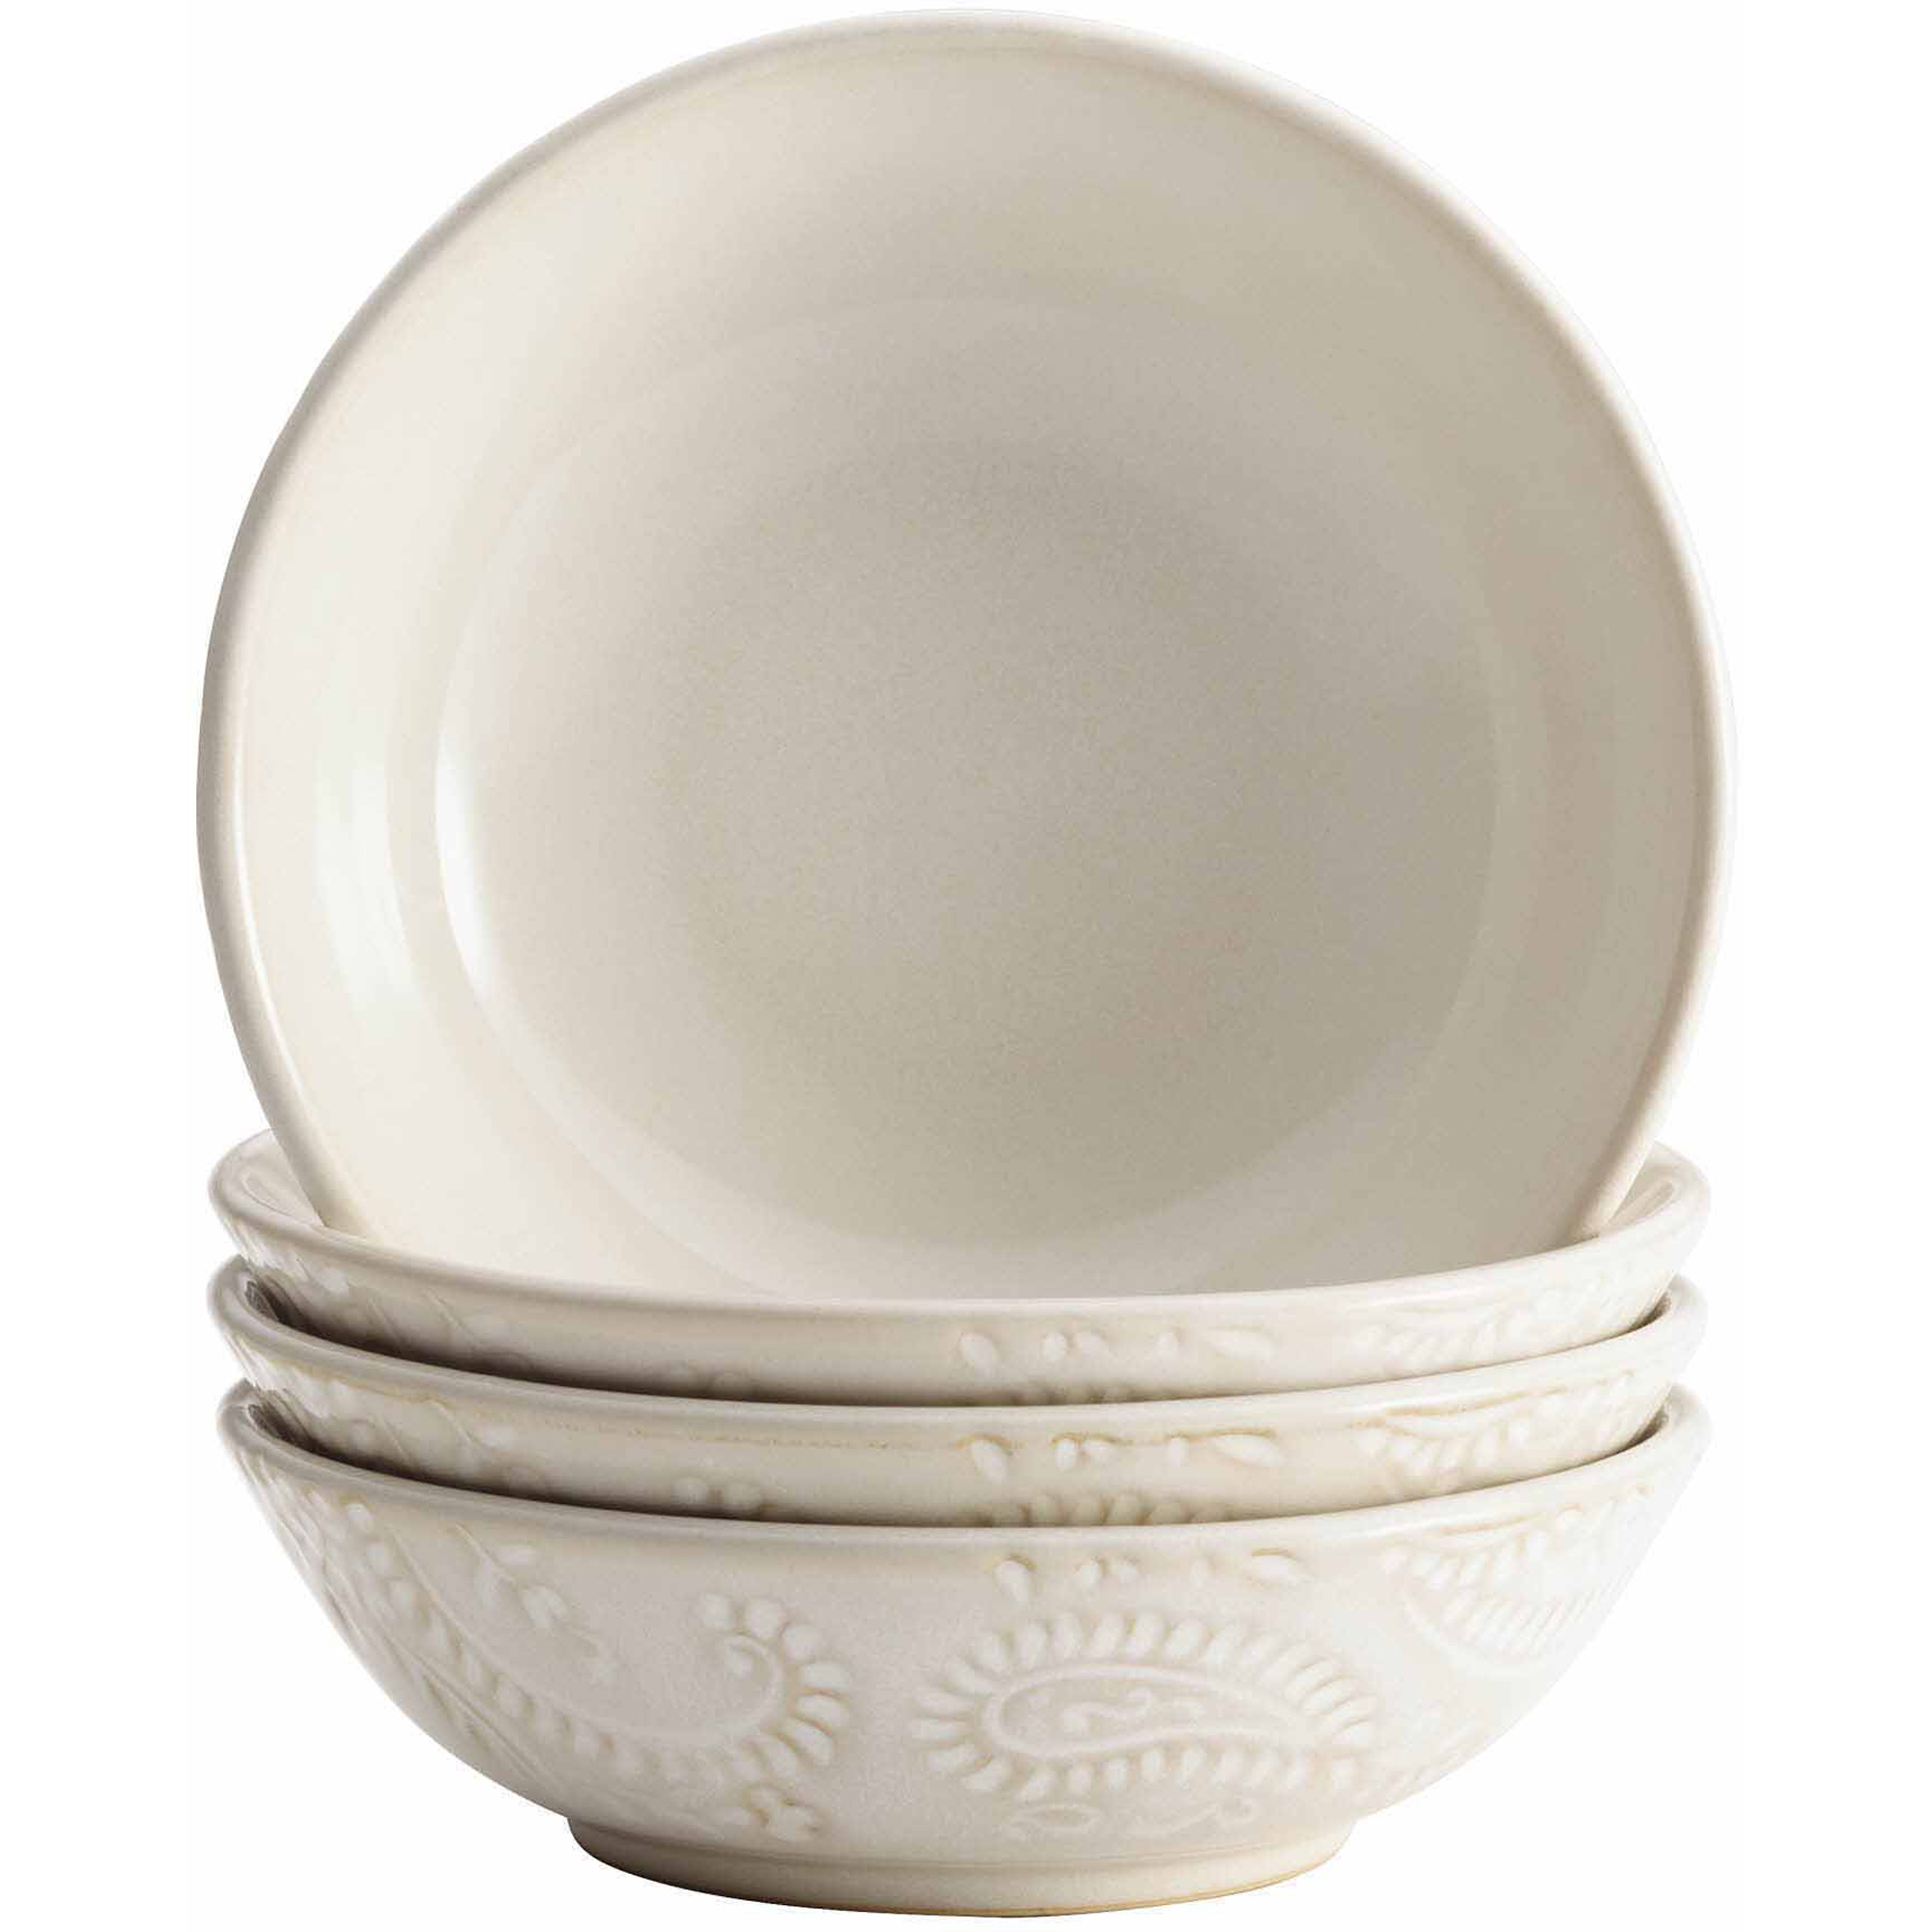 BonJour Dinnerware Paisley Vine 4-Piece Stoneware Fruit Bowl Set, Cream - 54973